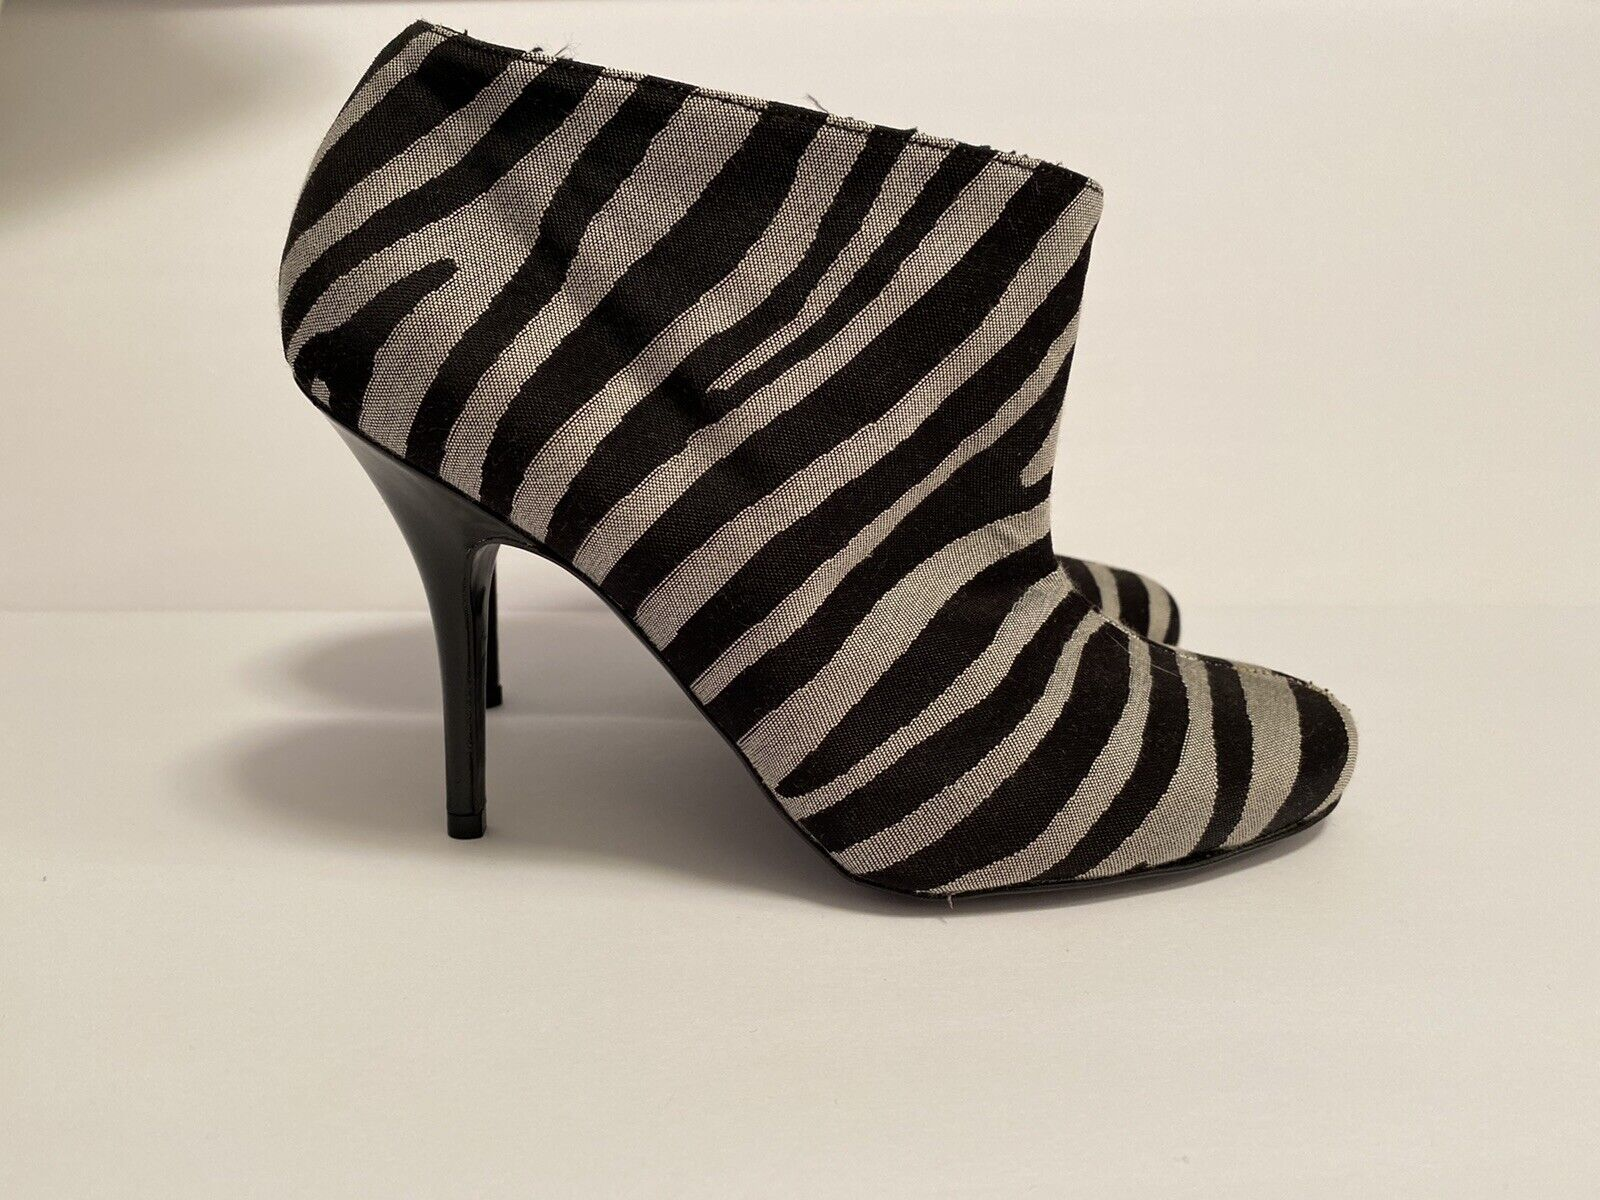 Stella McCartney Zebra Striped Boots Size 36 - image 2